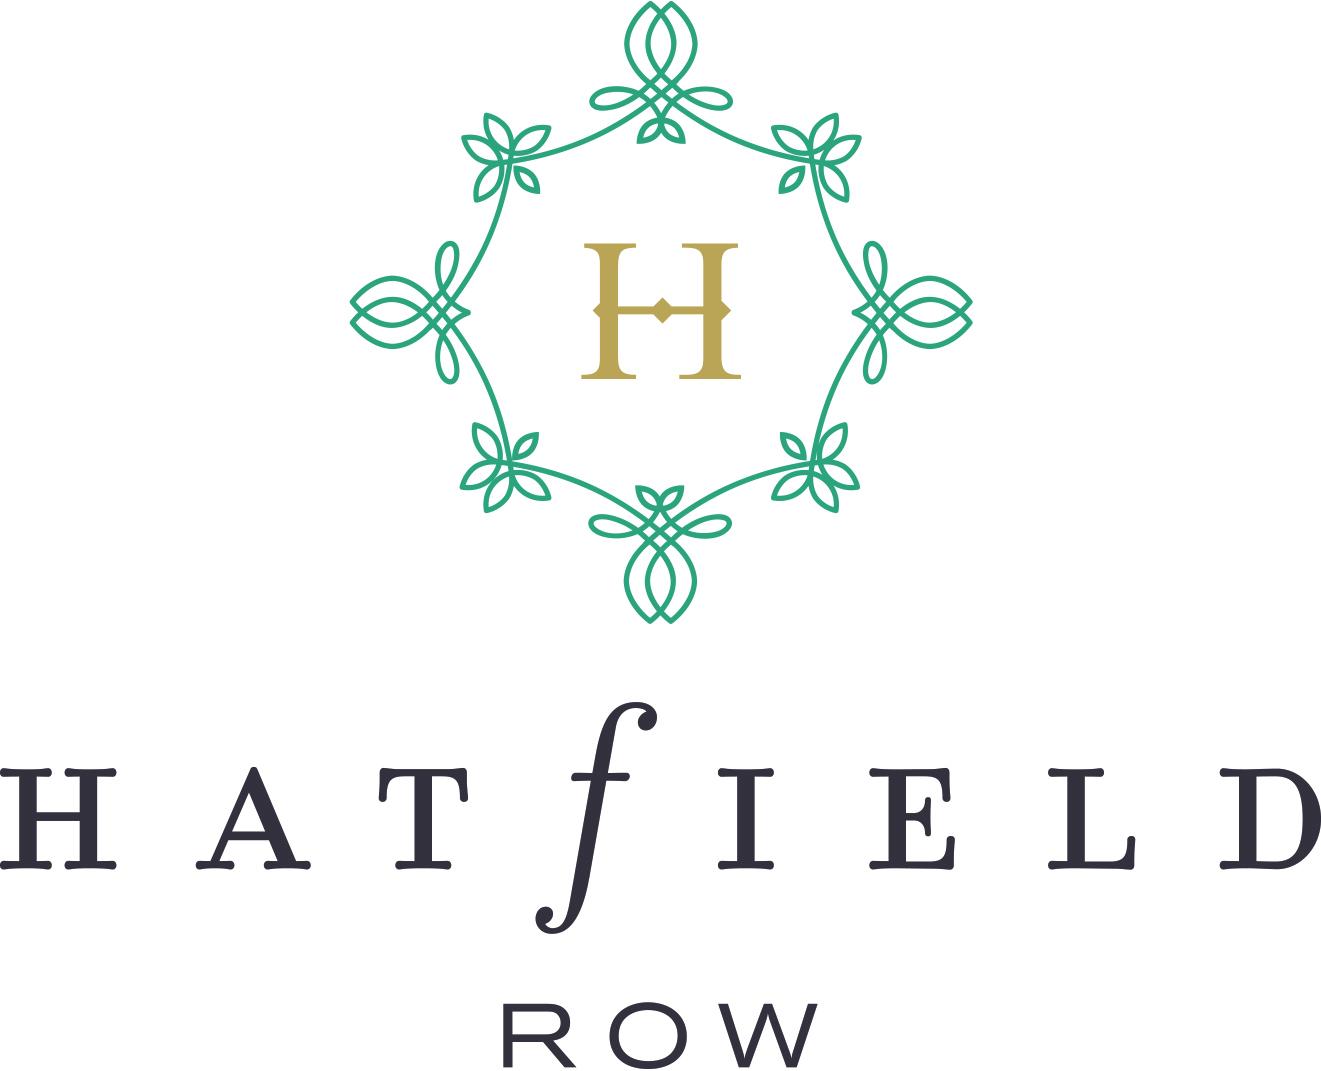 Hatfield_RowLawrenceville,_PA